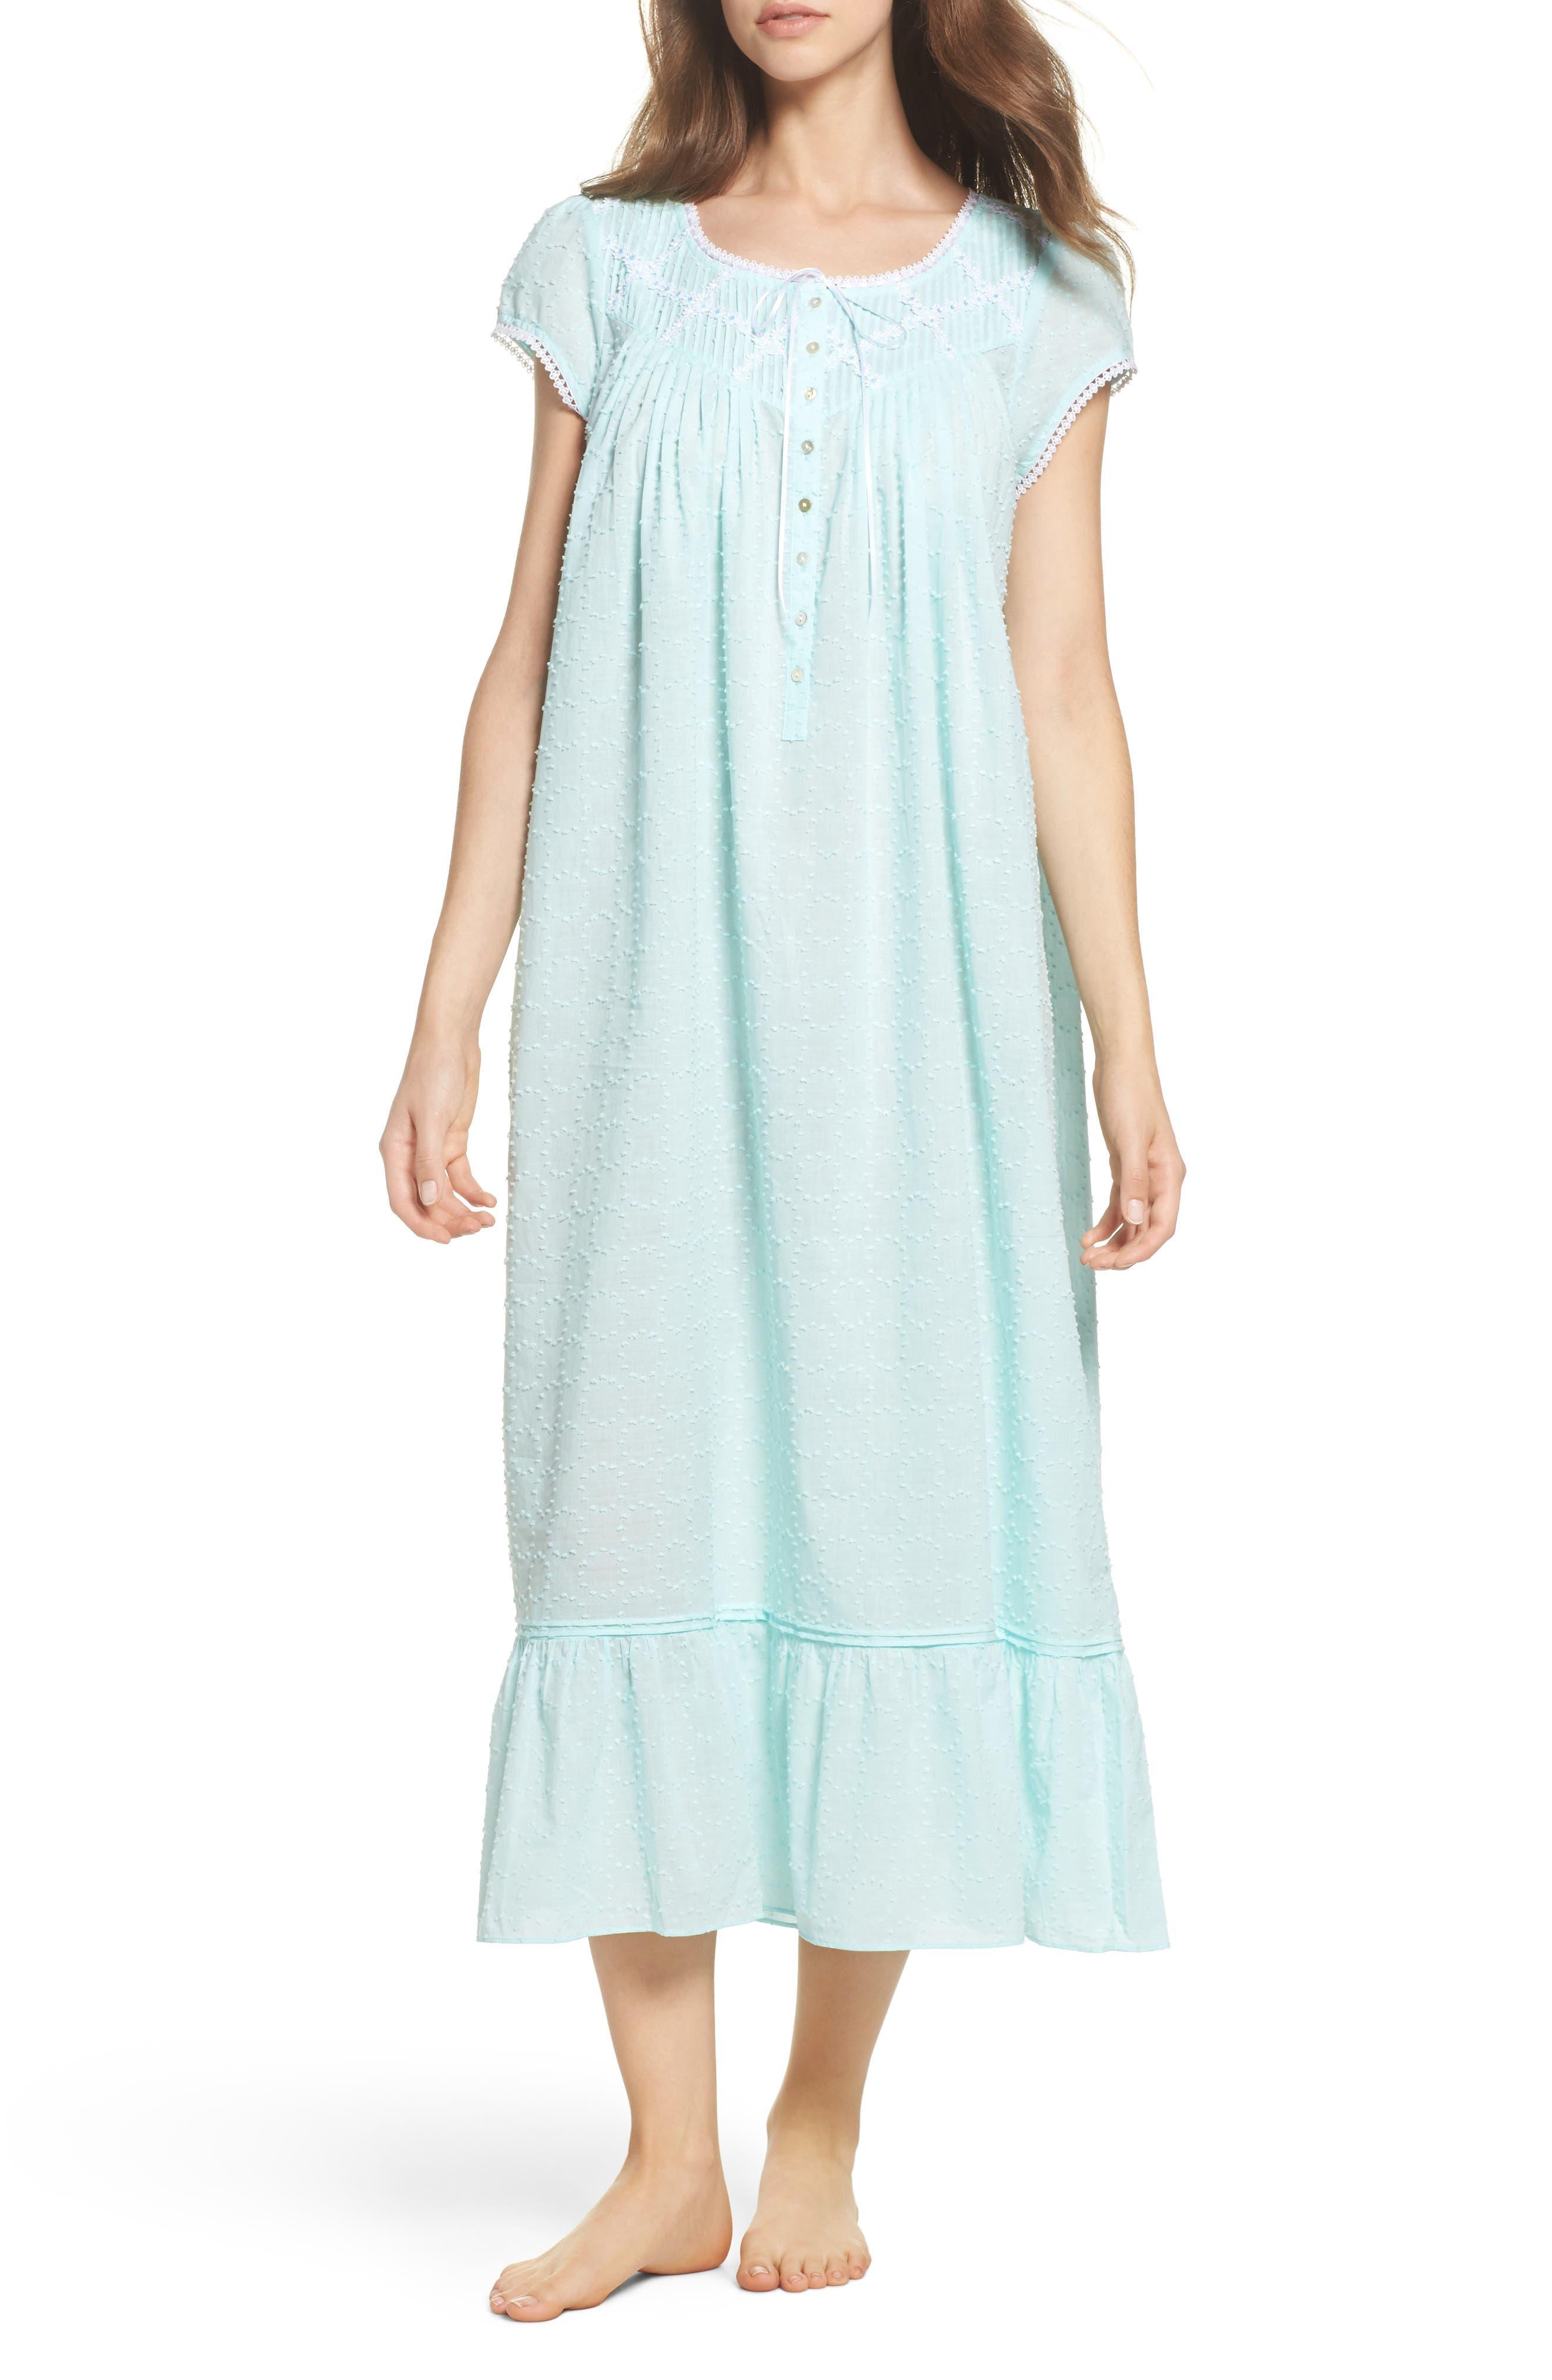 Cotton Ballet Nightgown,                         Main,                         color, Solid Aqua Circle Clip Dot